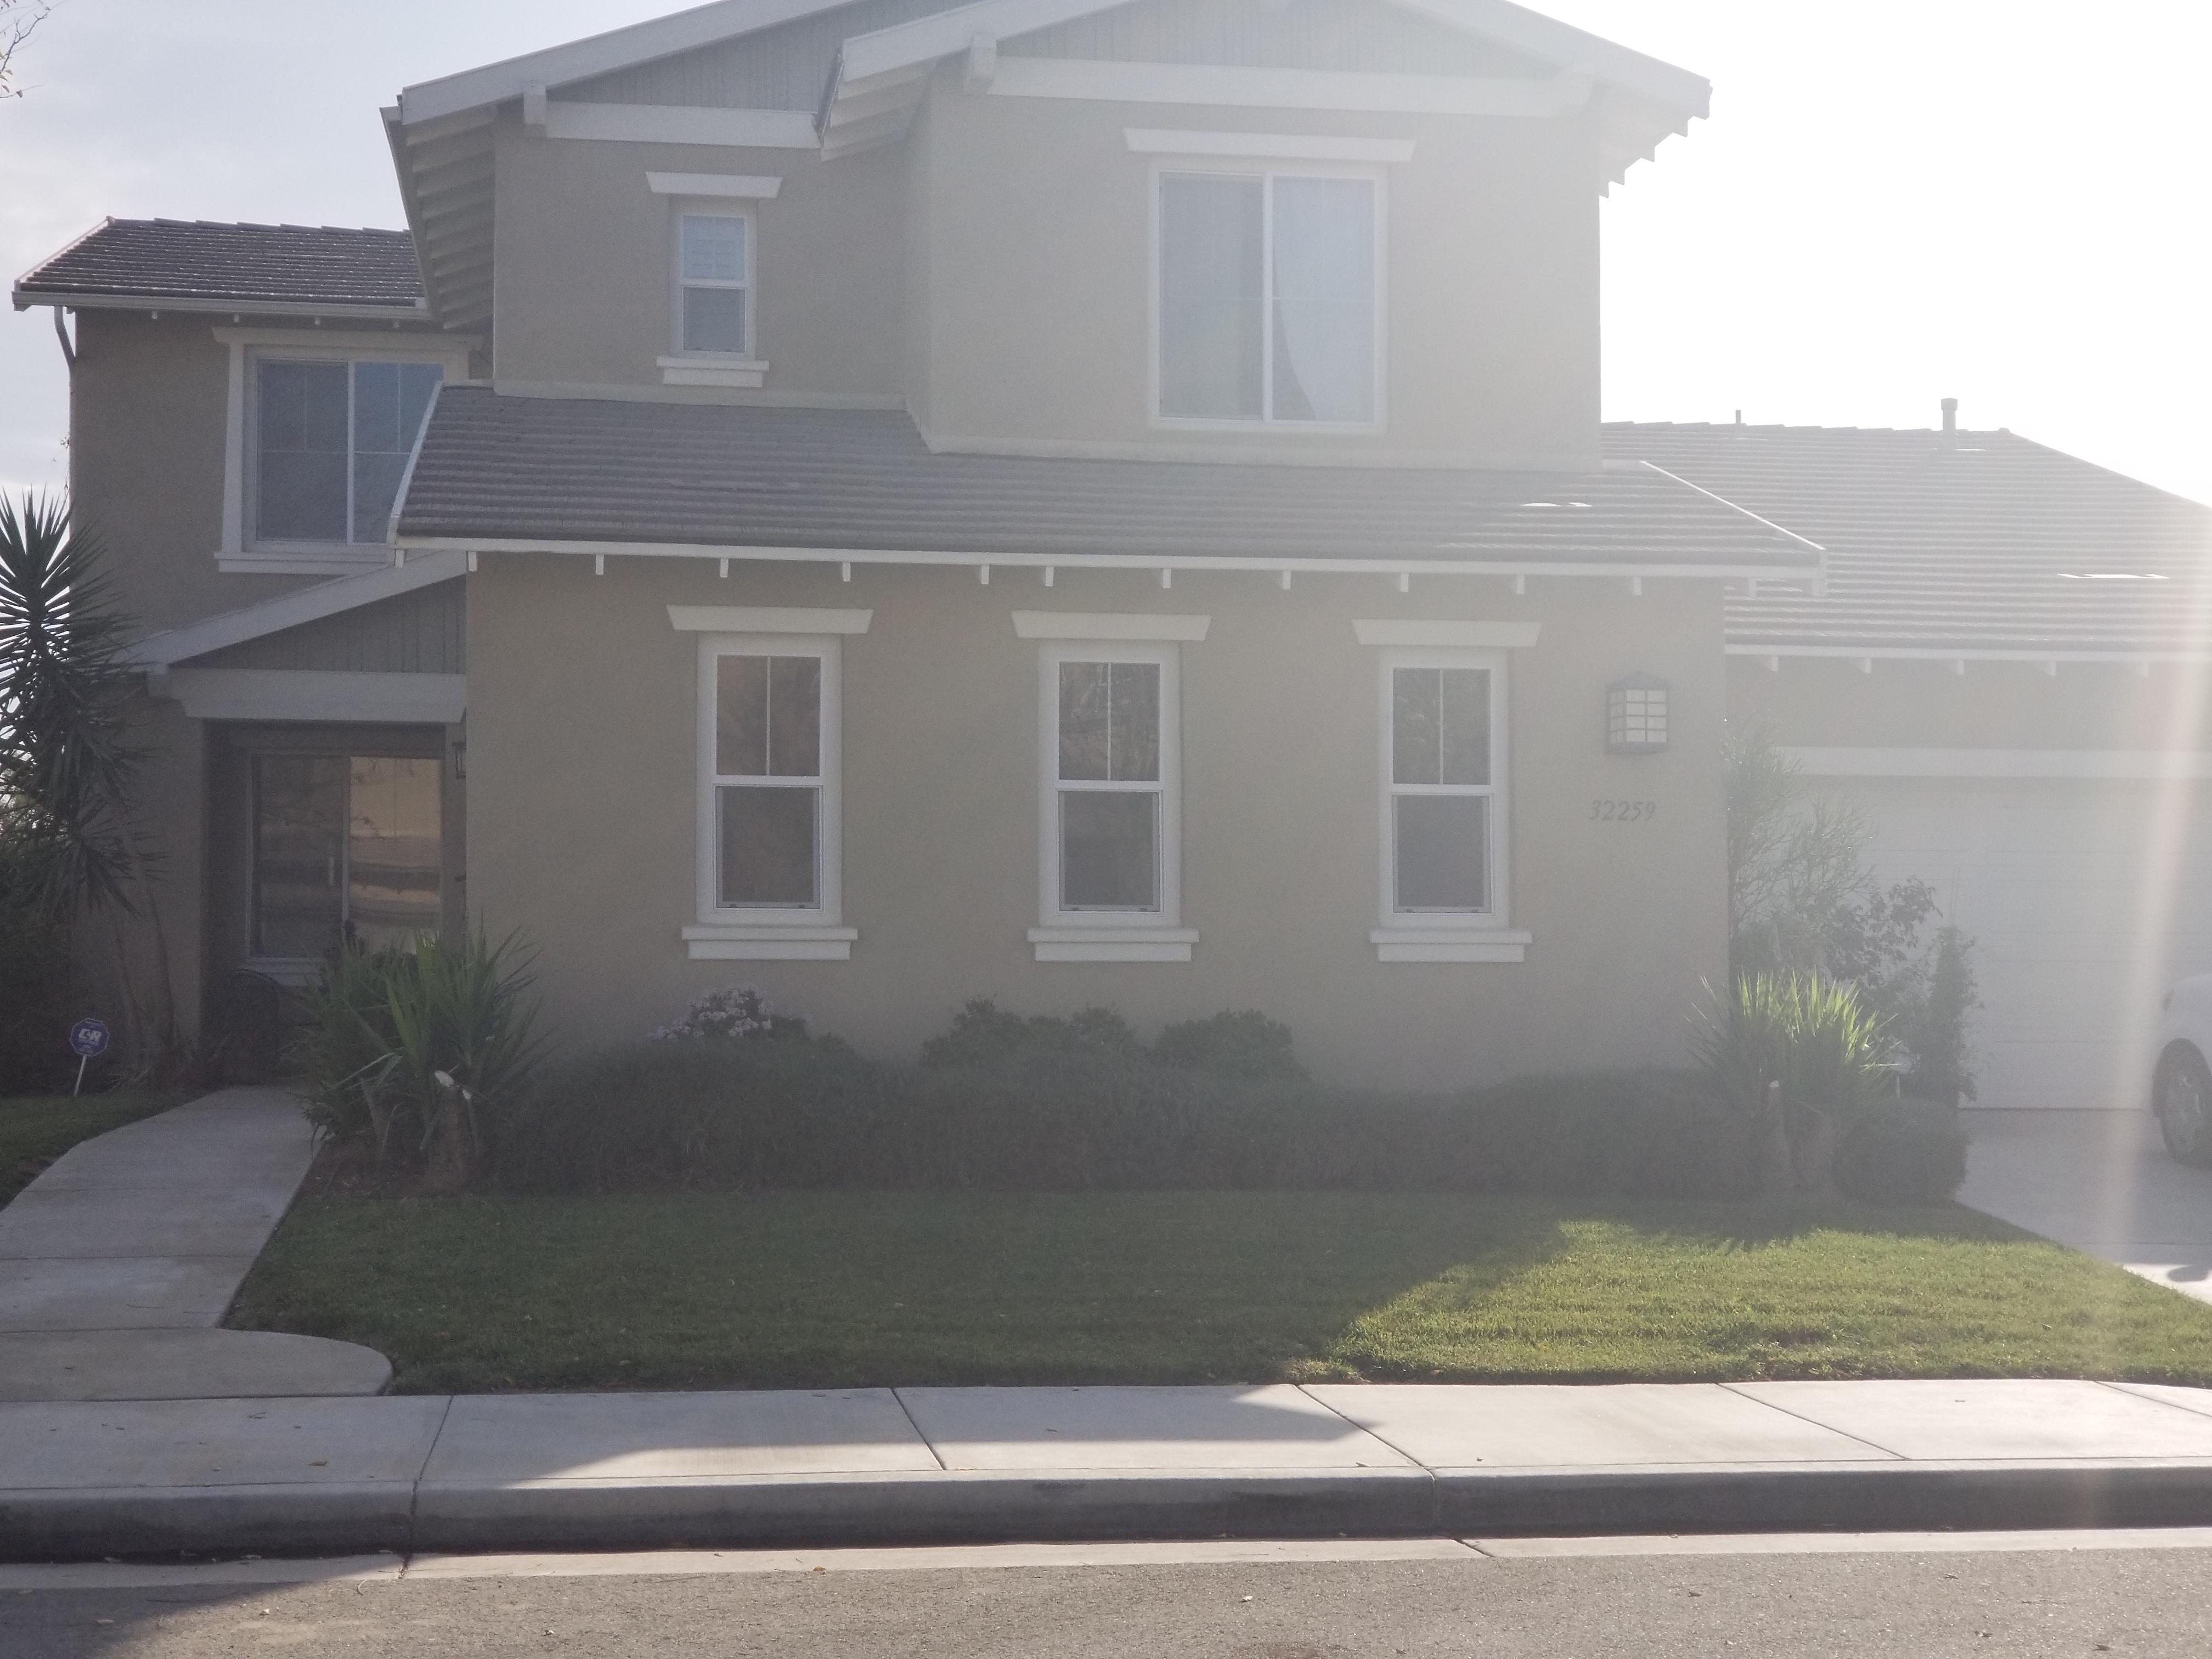 Photo of 32259 Honeybee Drive, Winchester, CA, 92596